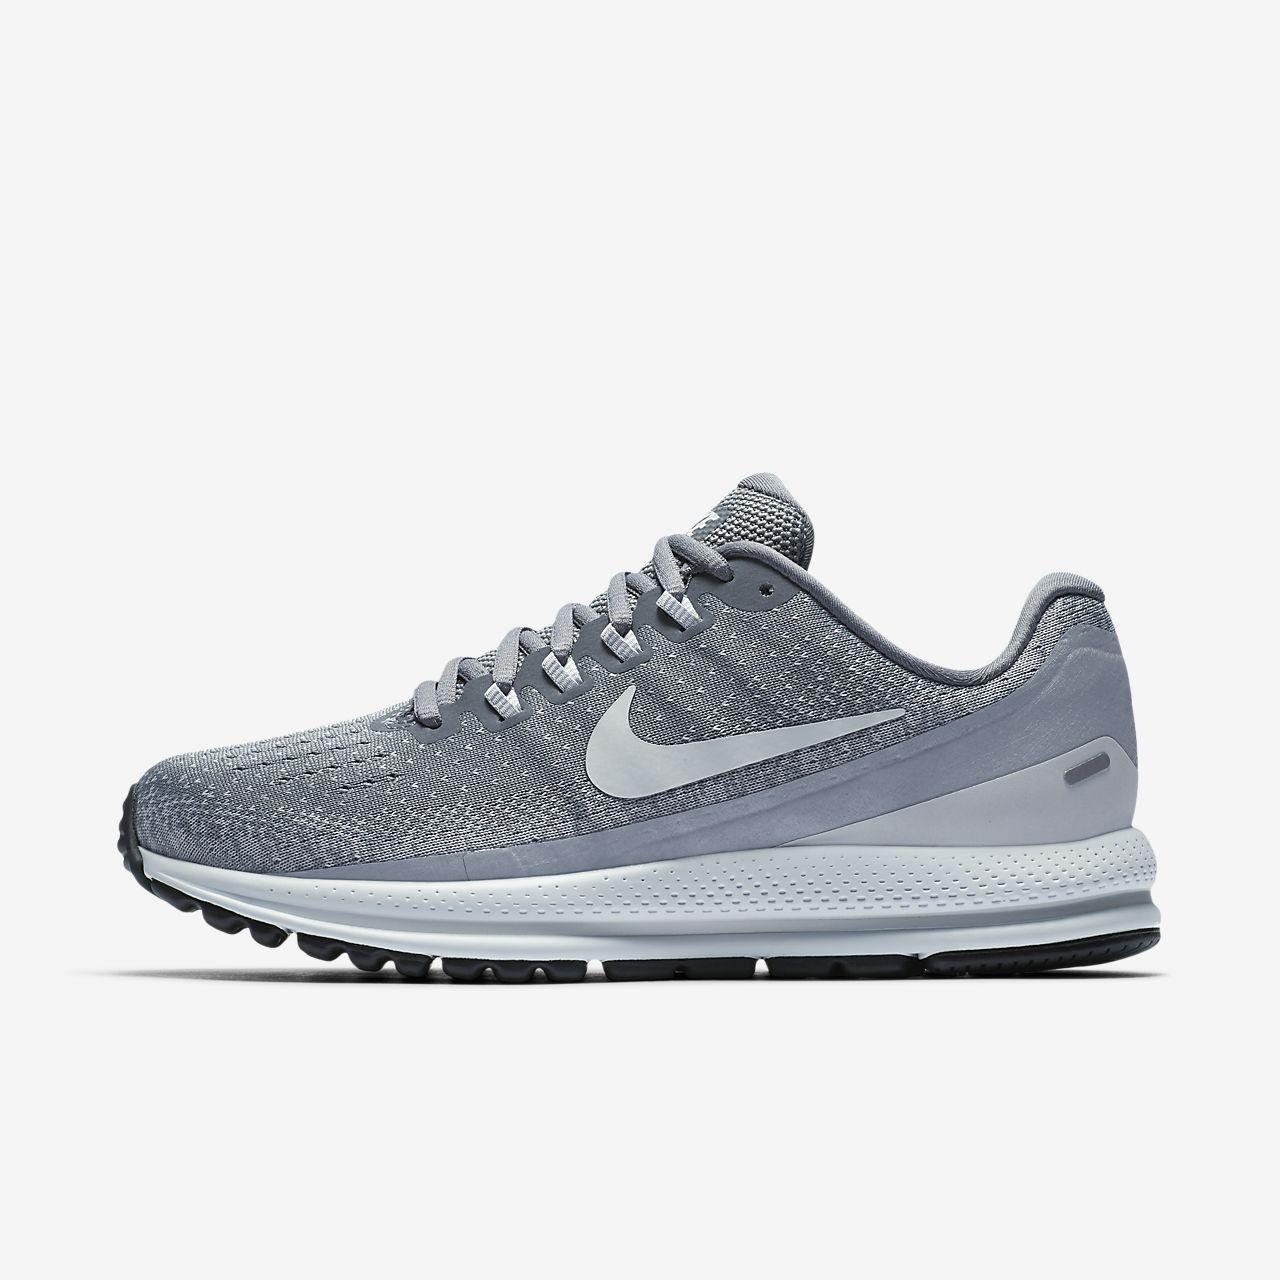 a288a968532d Nike Air Zoom Vomero 13 (Wide) Women s Running Shoe. Nike.com CA